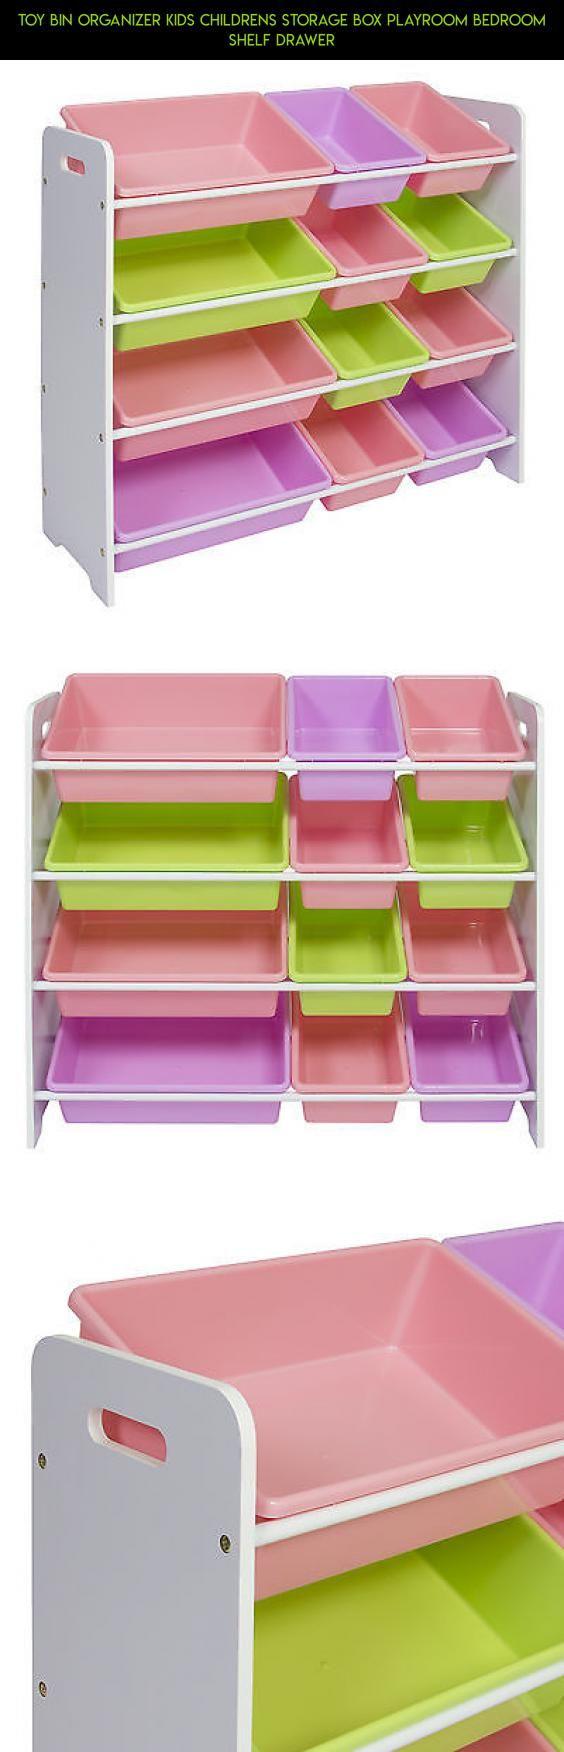 Toy Bin Organizer Kids Childrens Storage Box Playroom Bedroom Shelf Drawer #racing #shopping #technology #storage #kit #kids #products #camera #parts #drone #tech #plans #fpv #gadgets